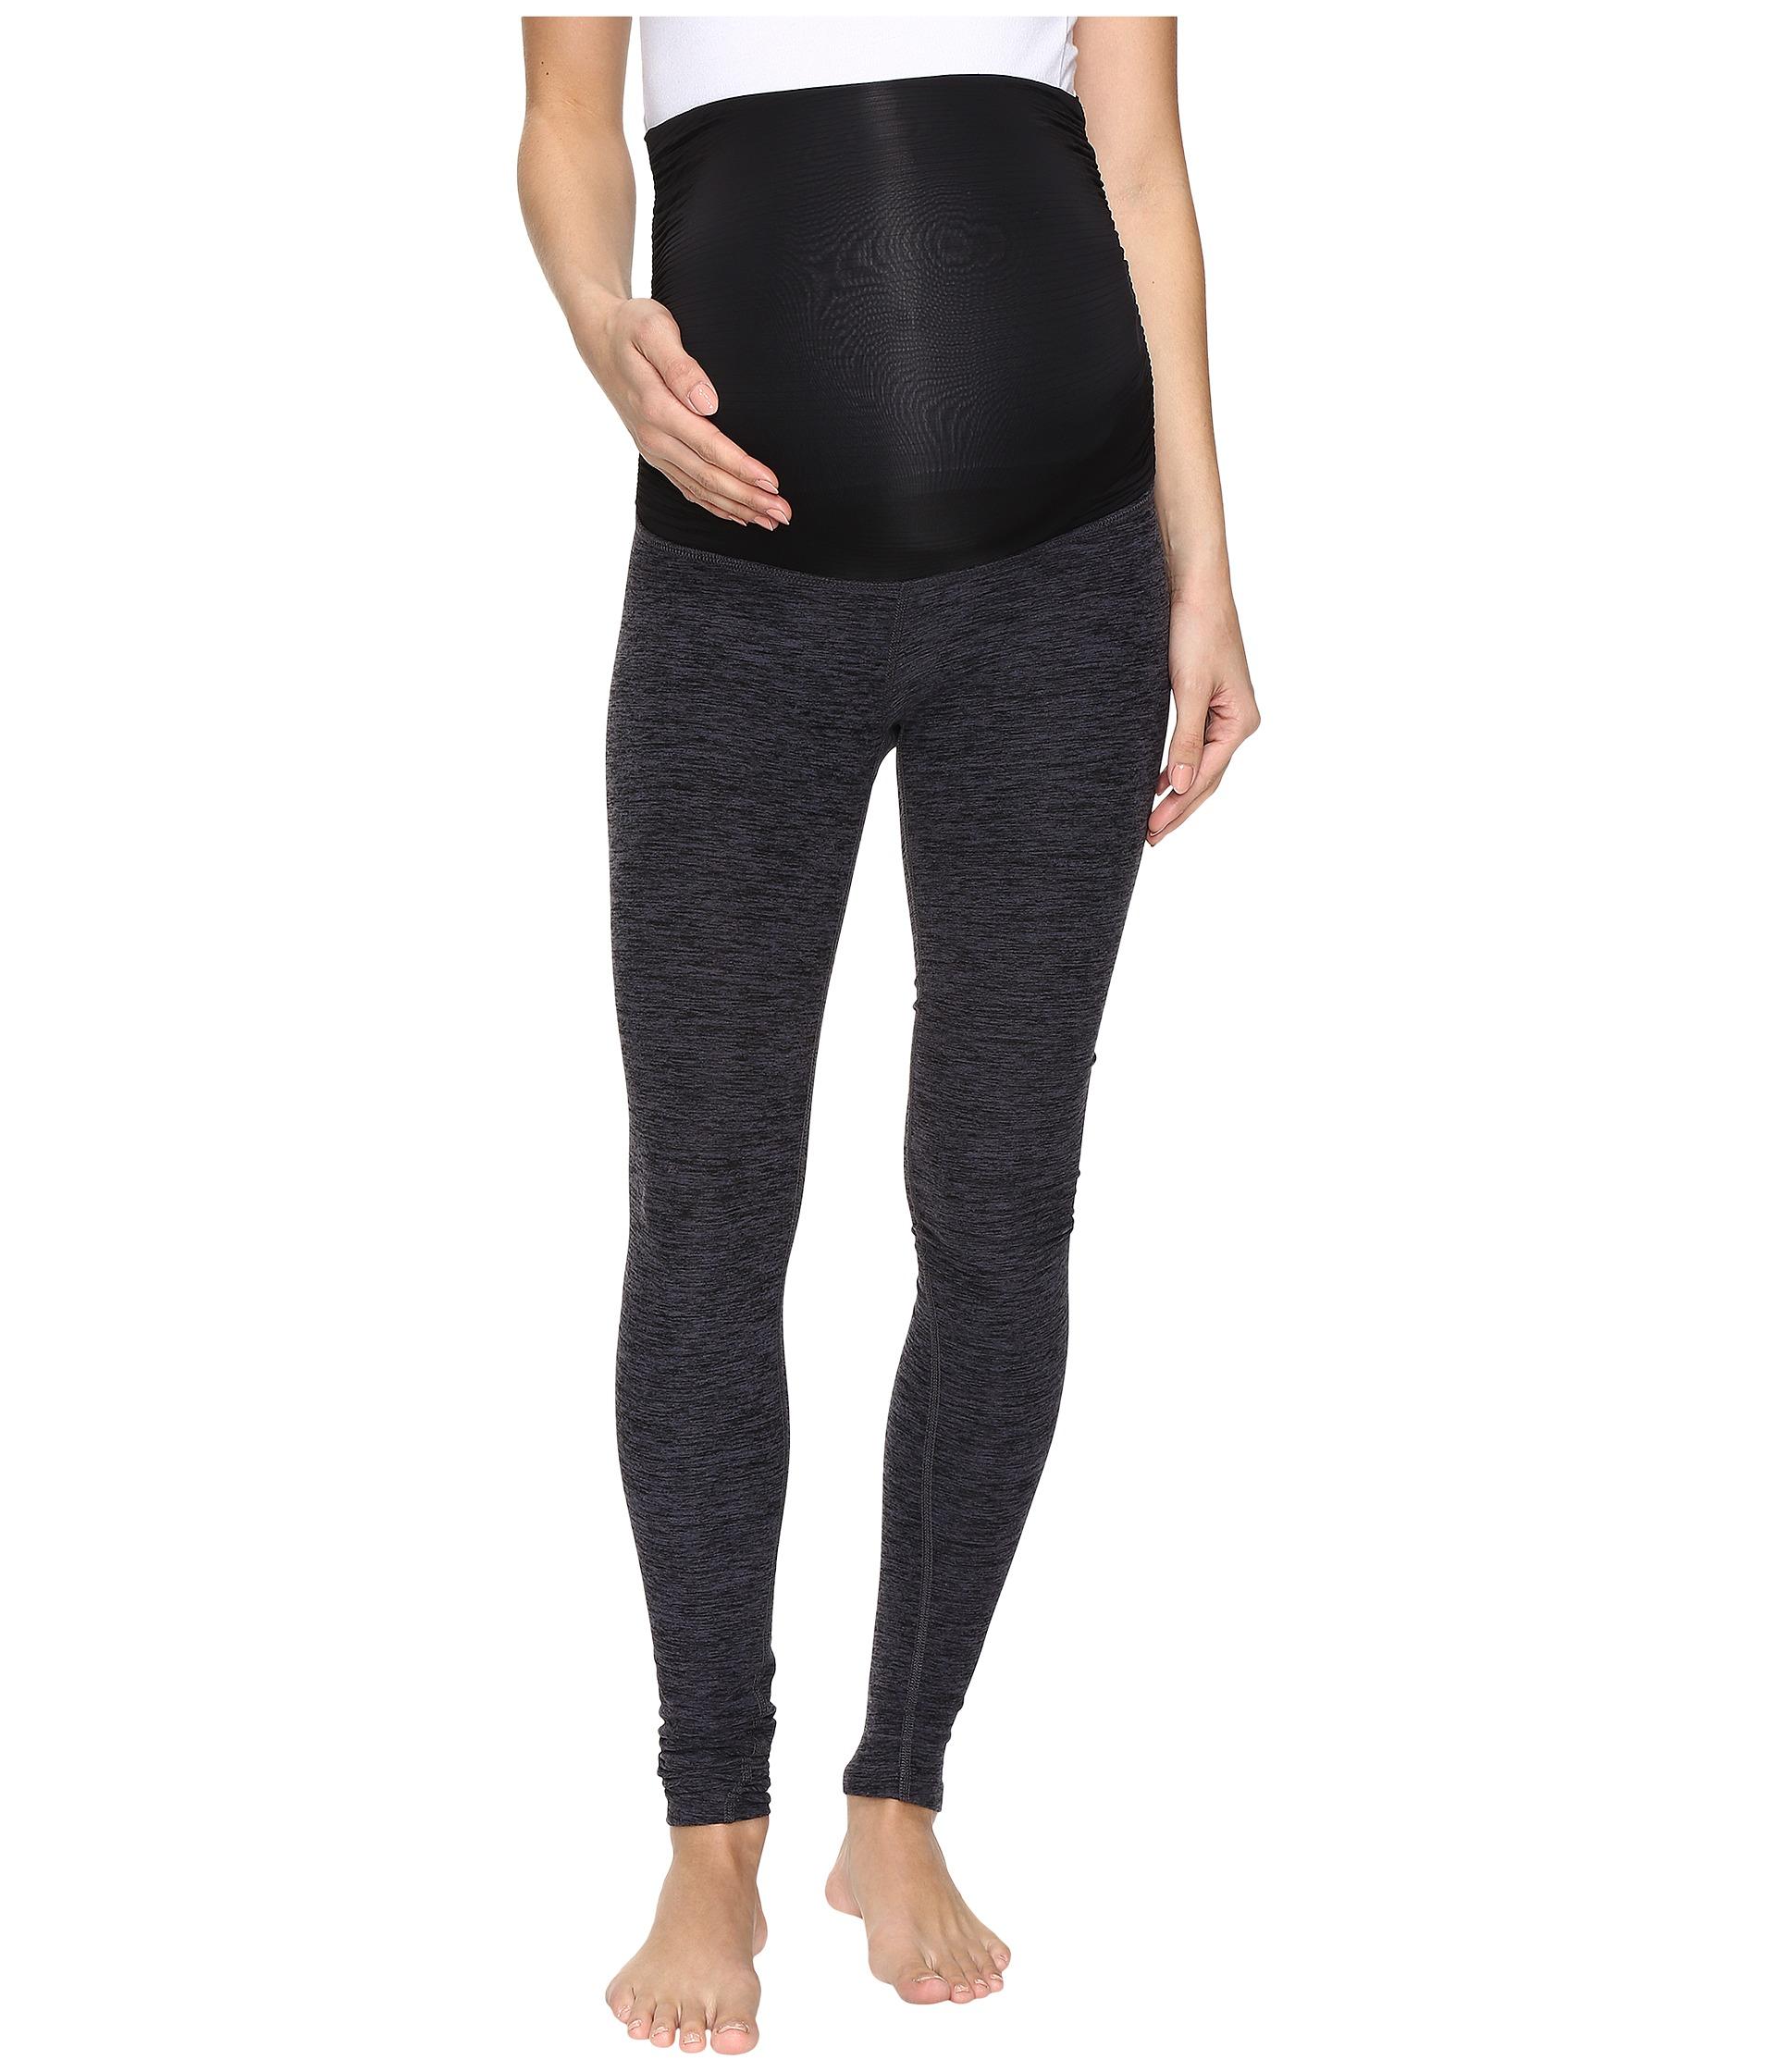 Beyond Yoga Fold Down Maternity Long Leggings At Zappos.com